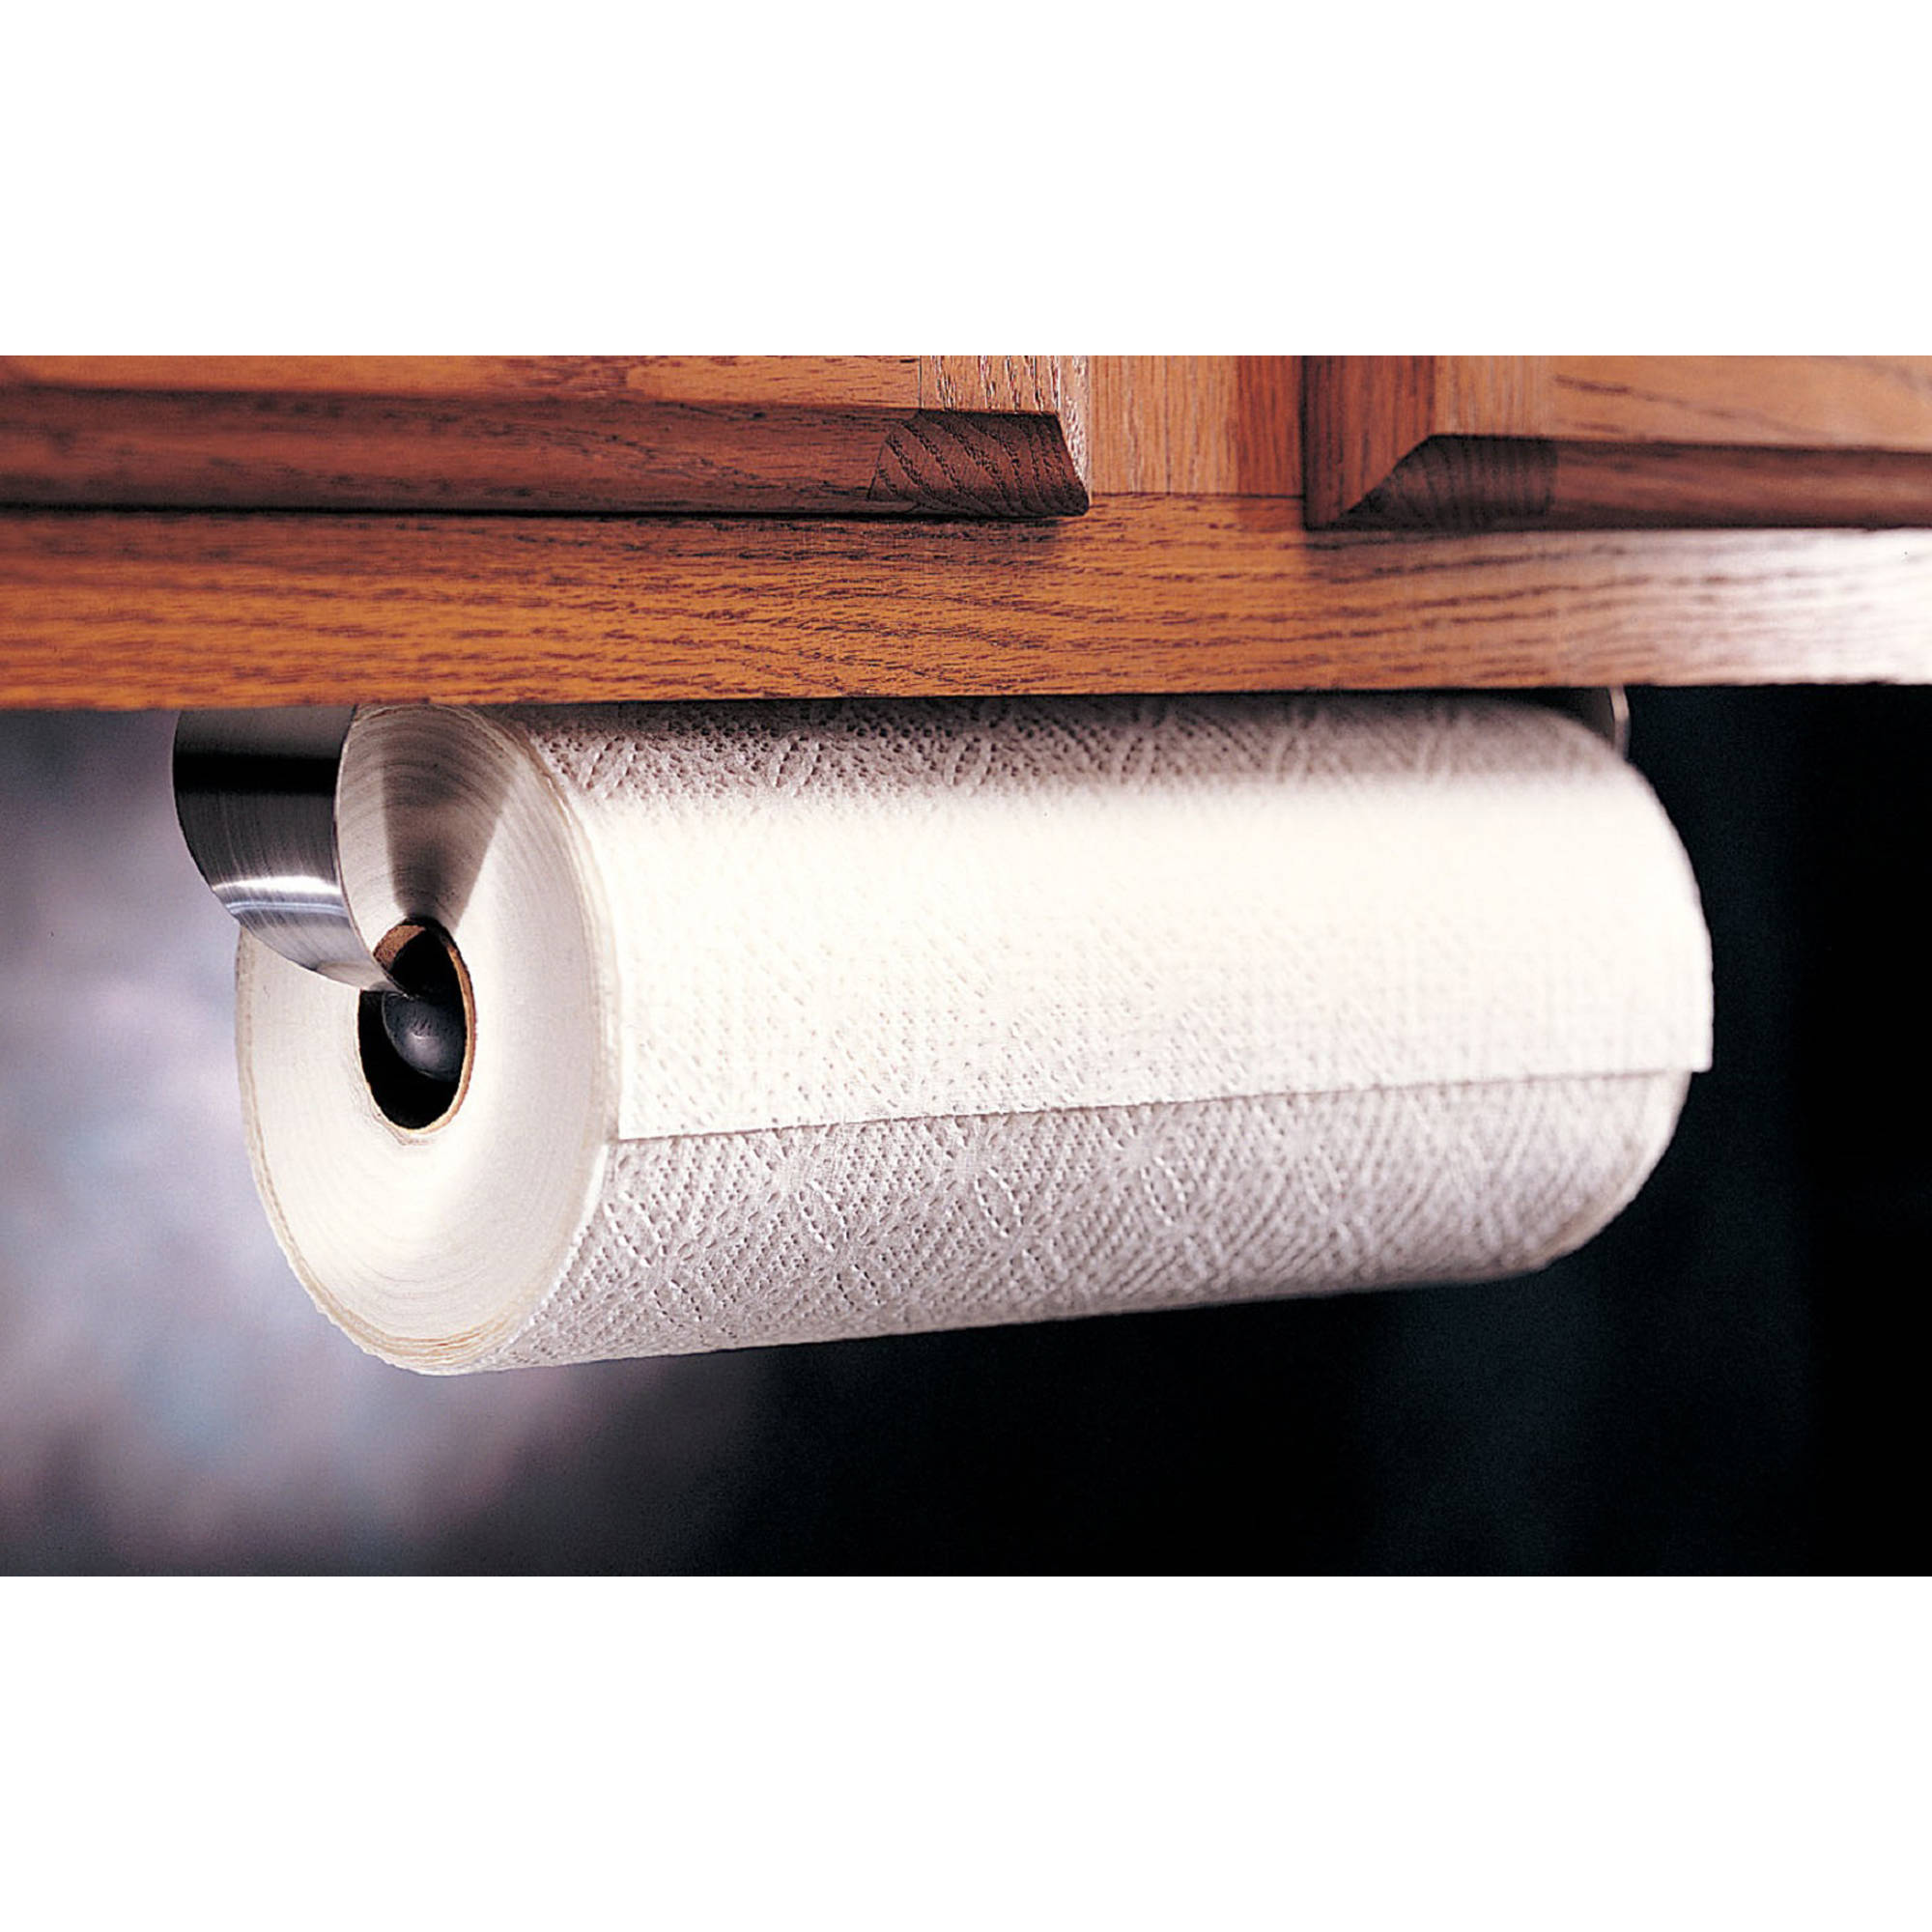 prodyne stainless steel under cabinet paper towel holder - walmart